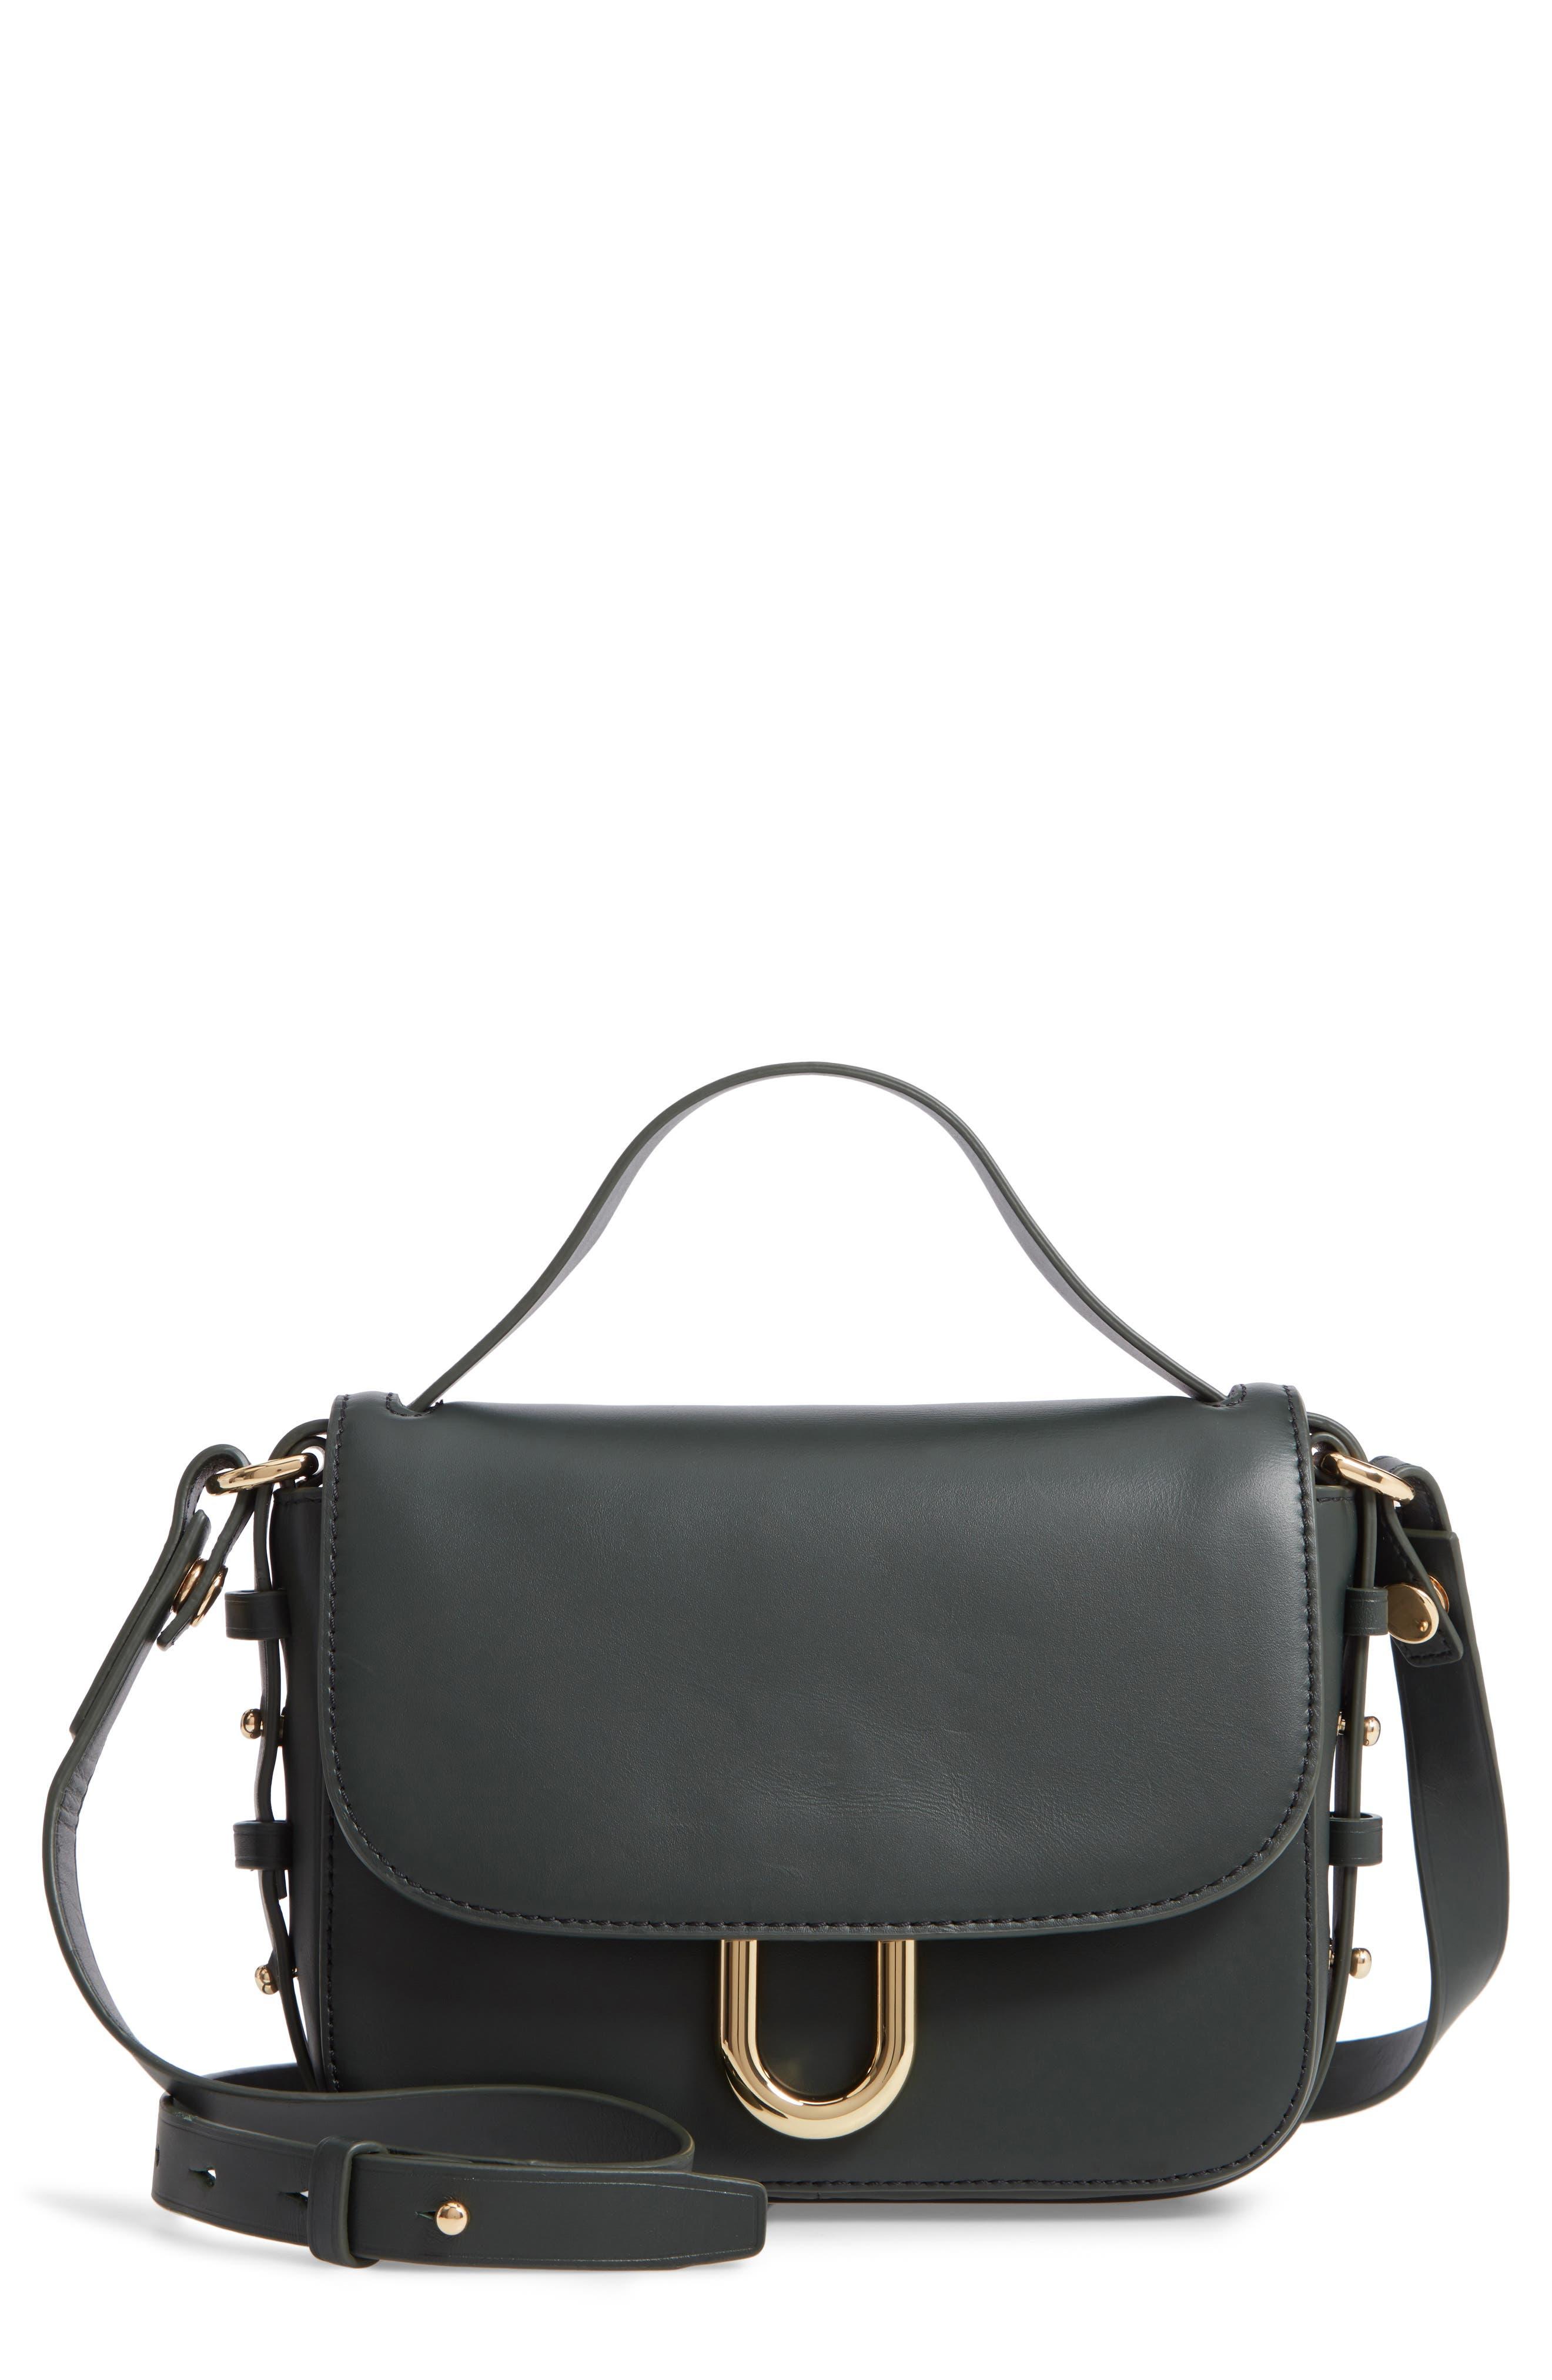 Harper Leather Crossbody Bag,                             Main thumbnail 1, color,                             DARK EVERGREEN